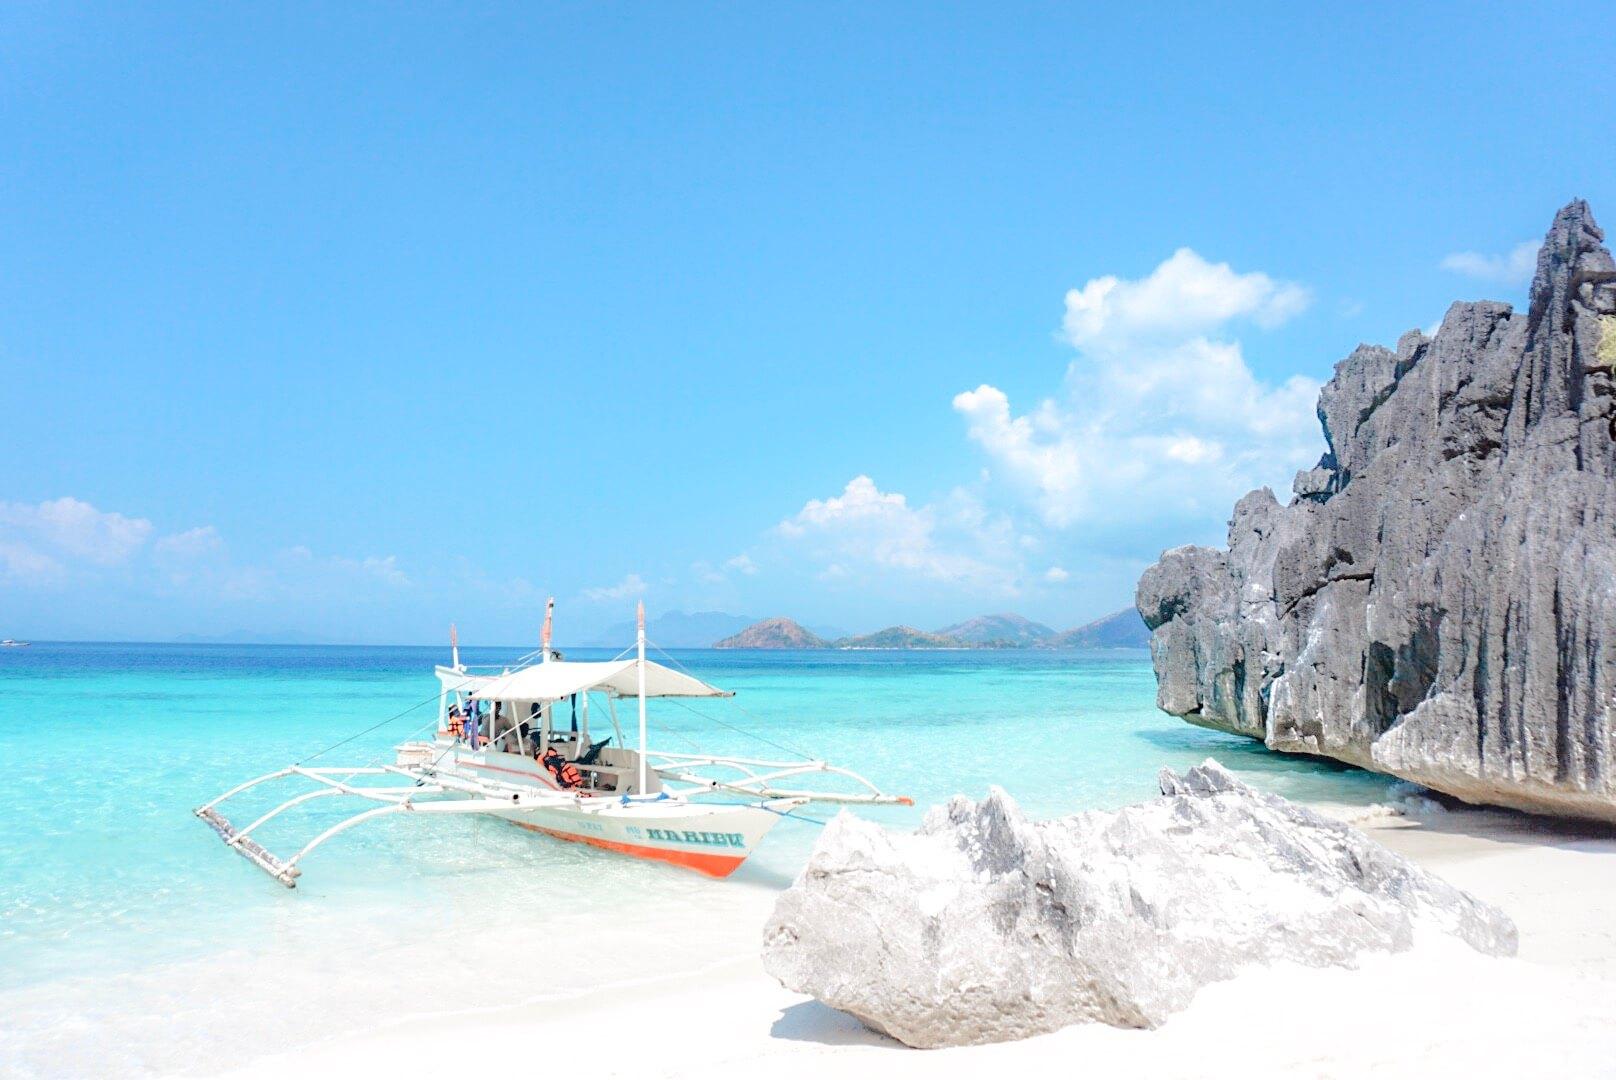 Banol Beach Philippines plage coron